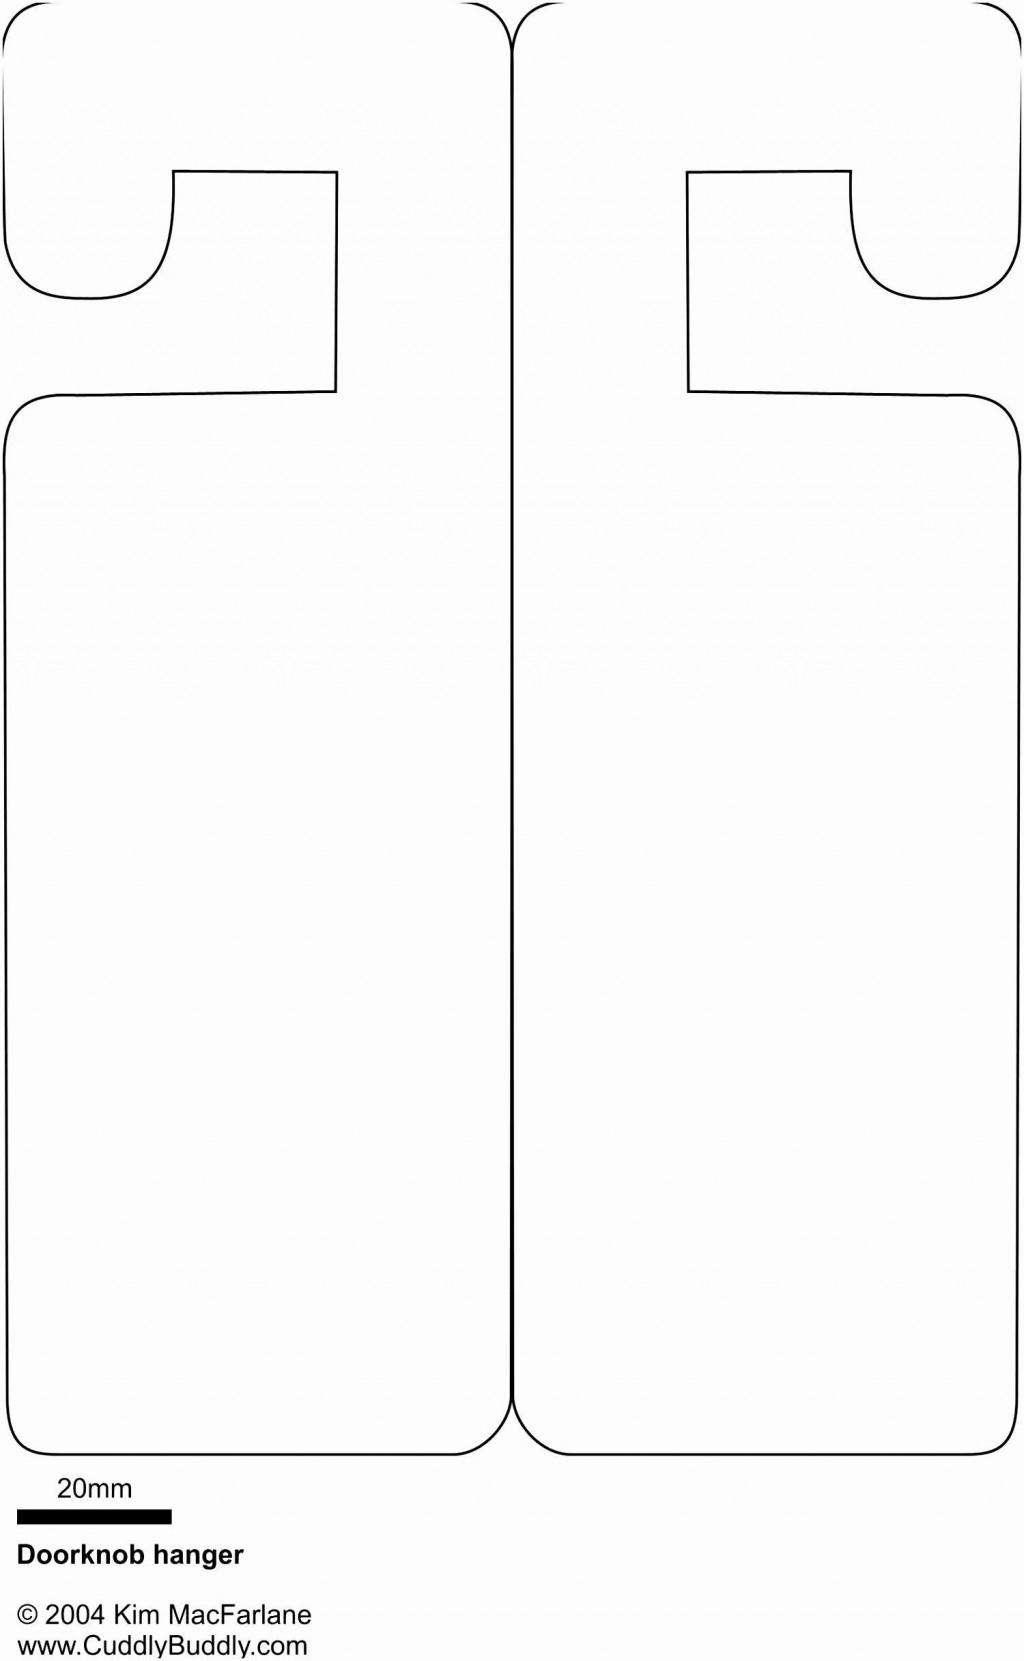 003 Outstanding Word Door Hanger Template Free Image  MicrosoftLarge